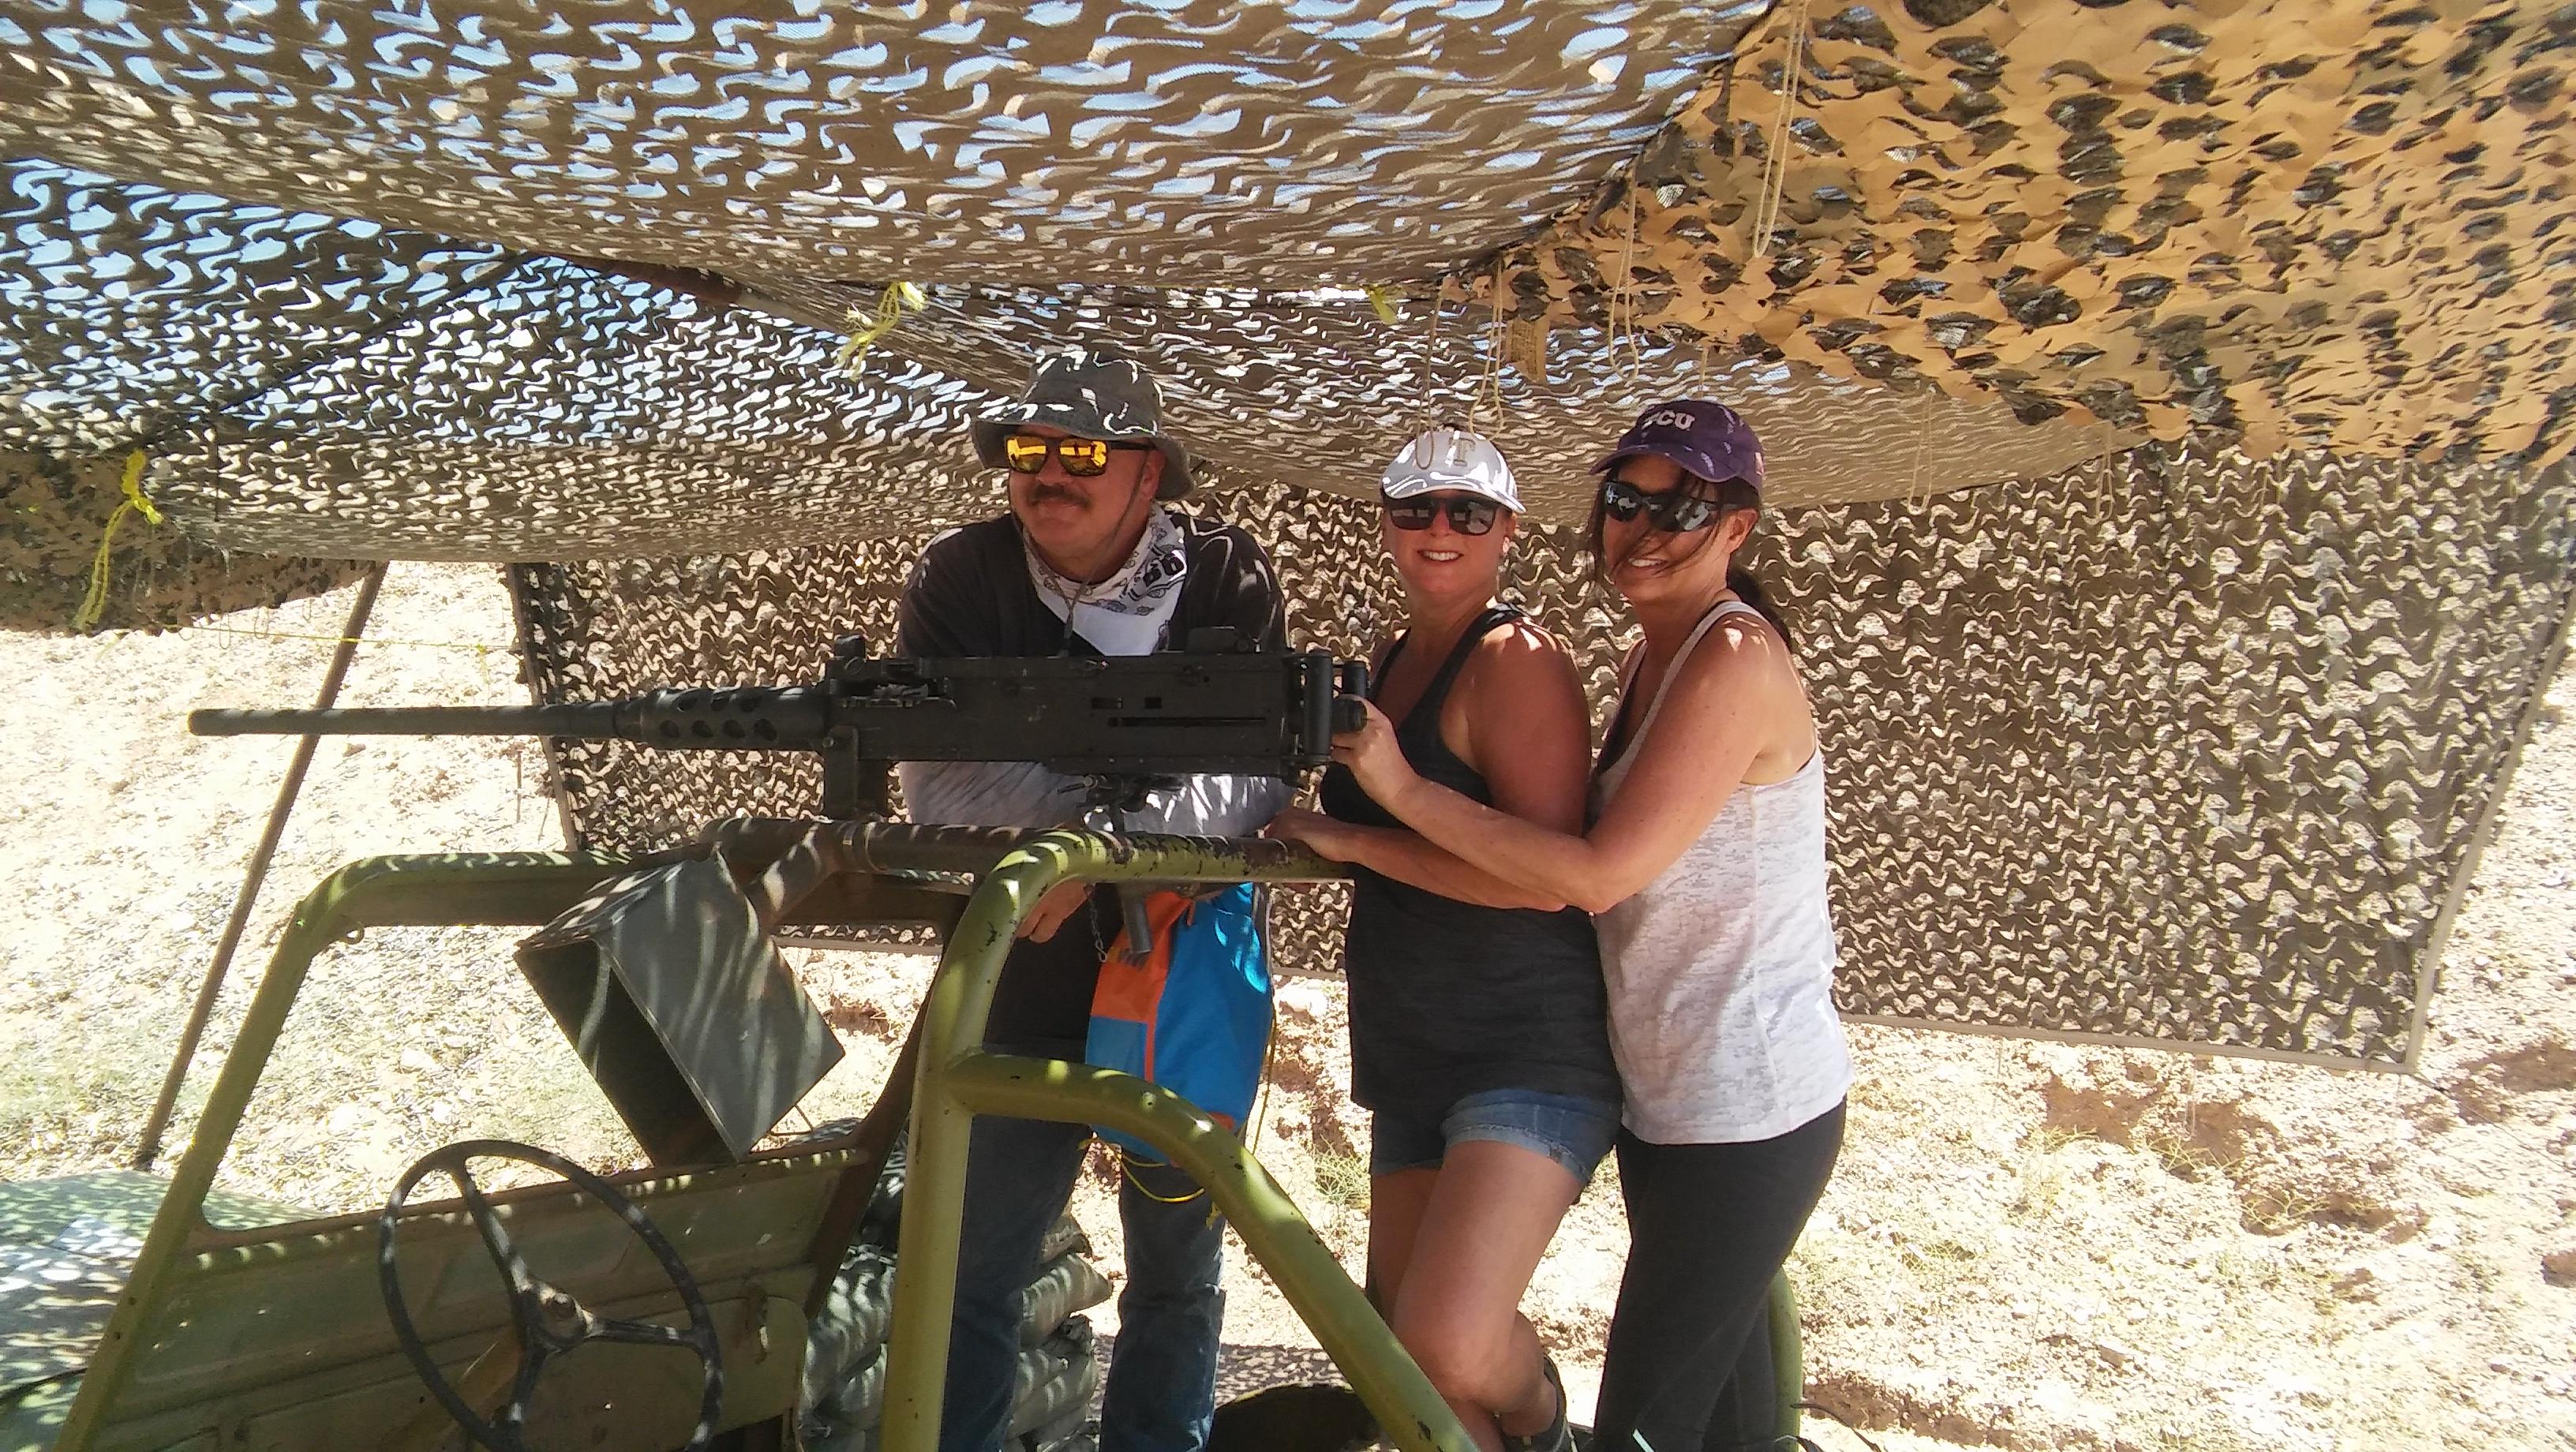 Shoot Machine Guns Las Vegas